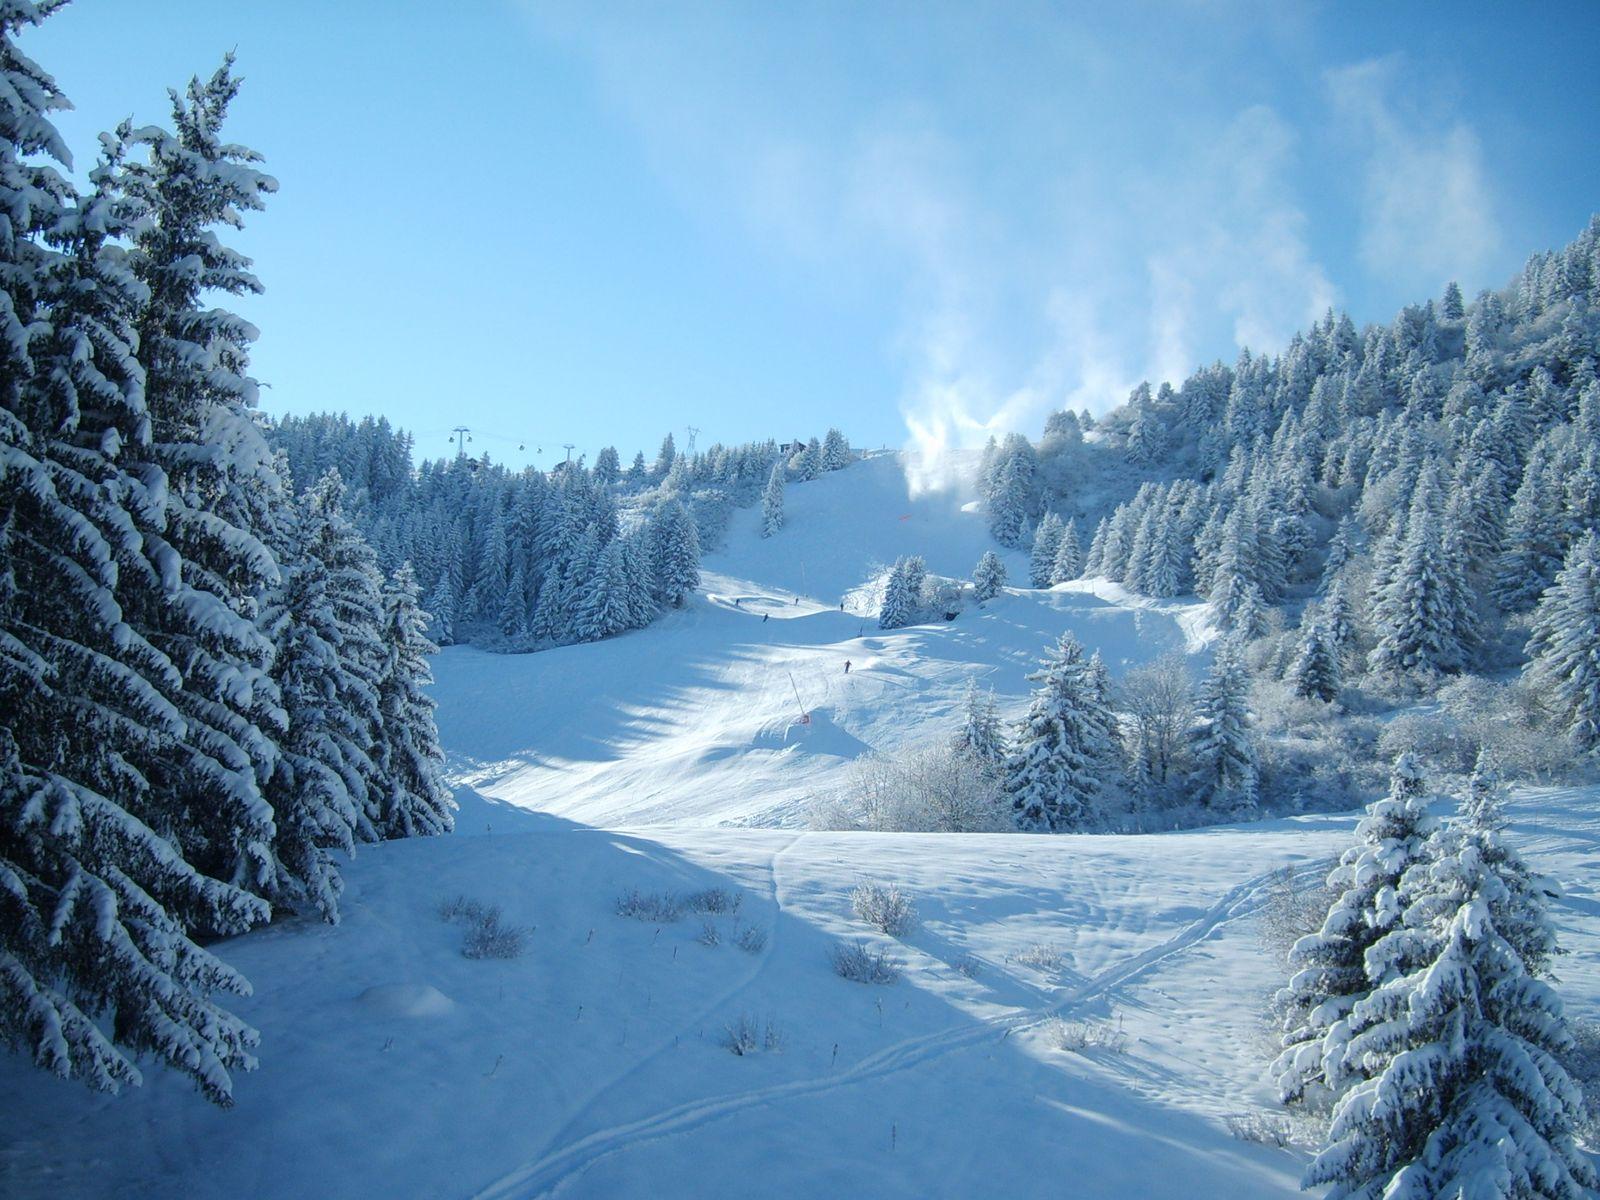 beautiful winter scenery winter wallpaper winter snowfall beautiful 1600x1200